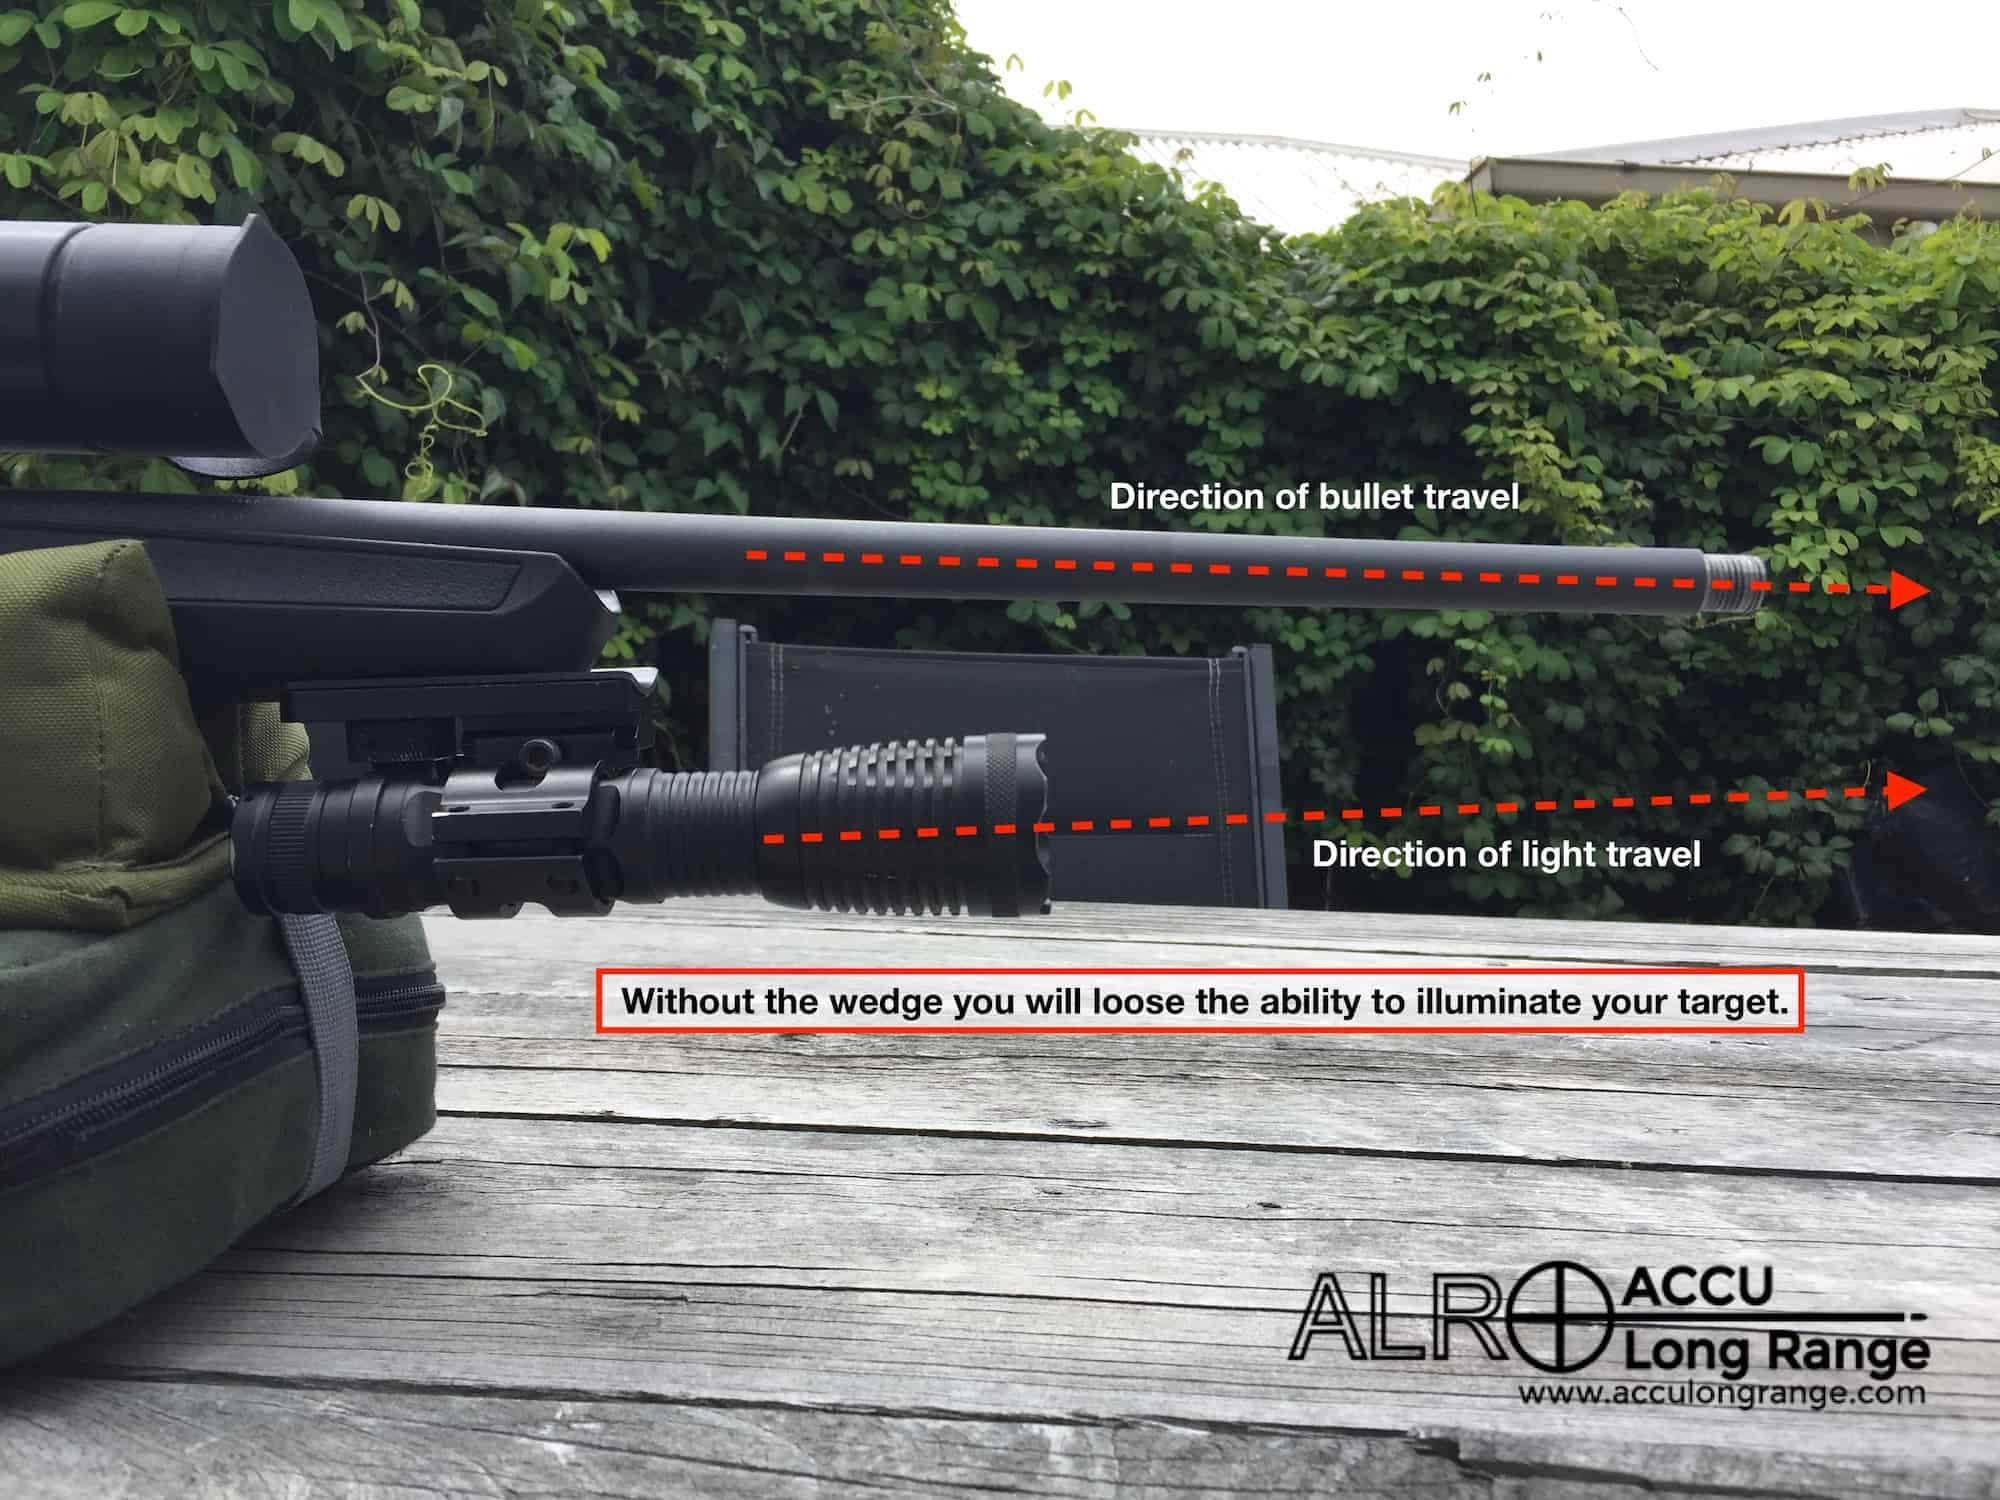 ACCU Long Range Stud picatinny style rail adapter & ACCU wedge kit